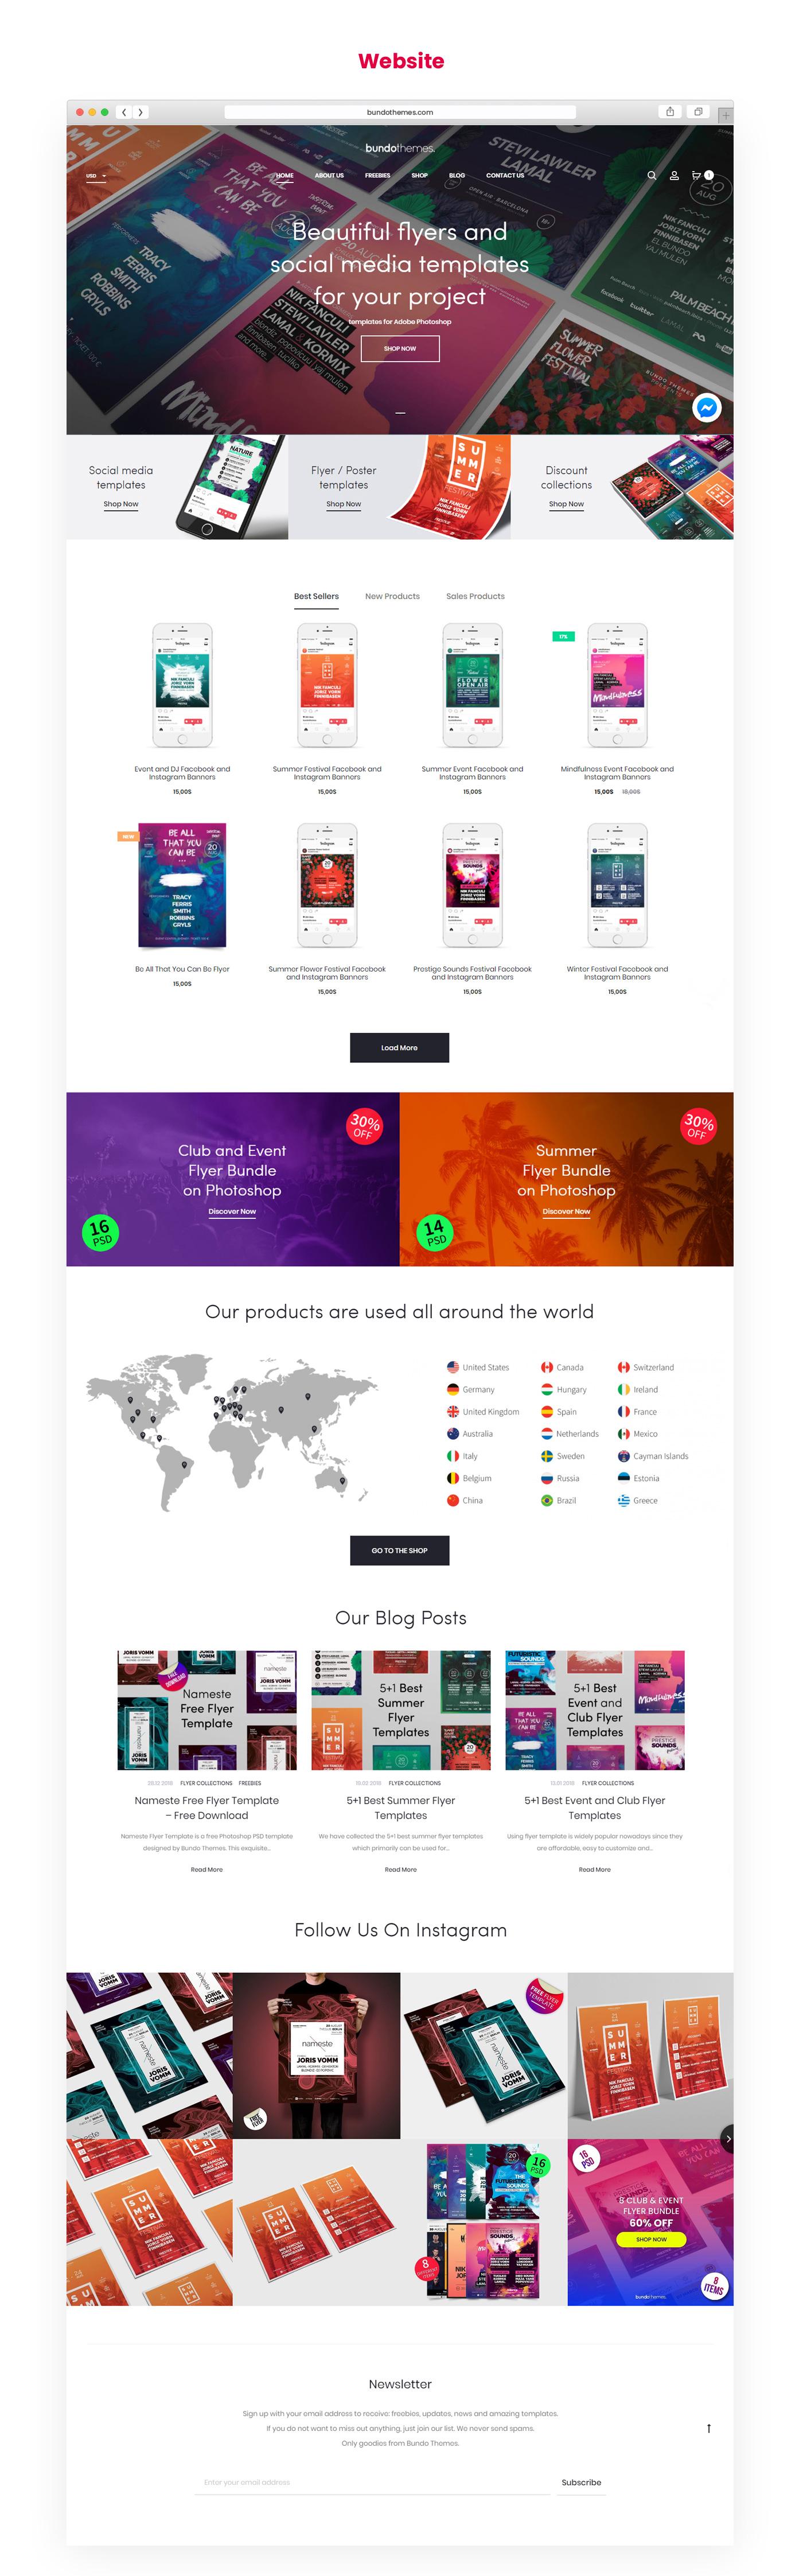 Webdesign UI ux branding  Website webshop templates art direction  flyer templates Responsive